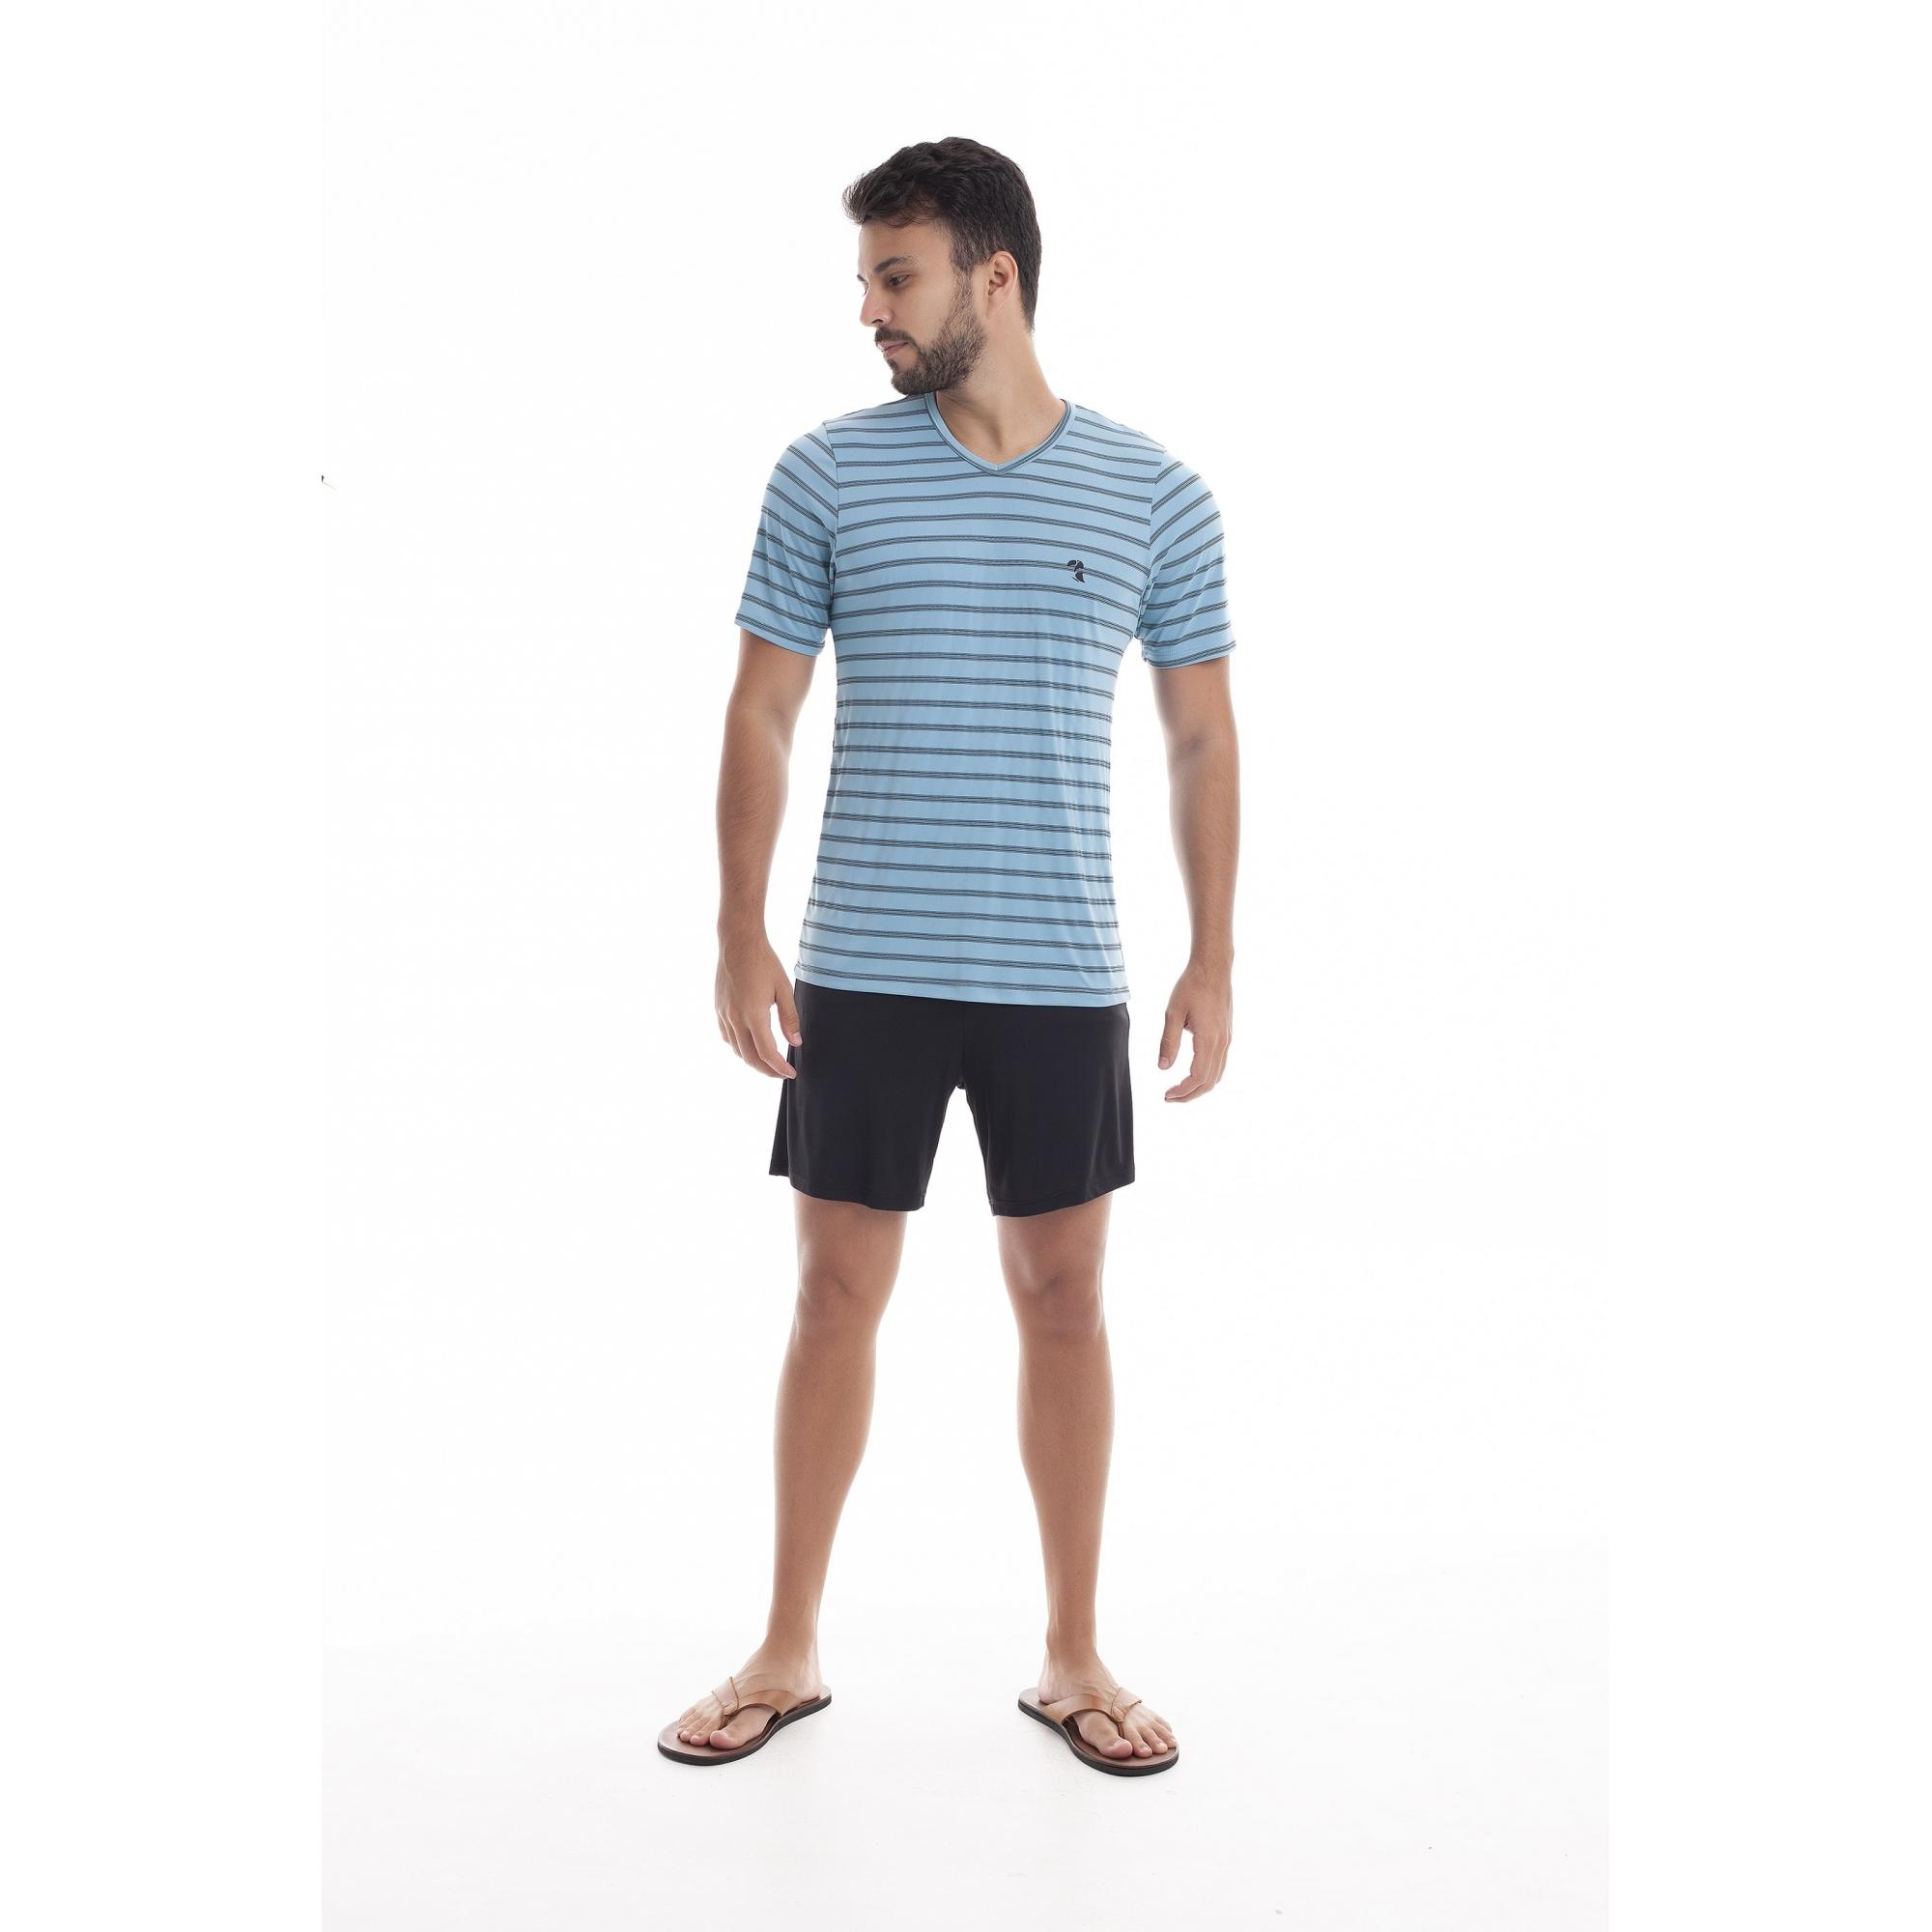 Pijama Masculino Adulto Paulienne Blusa listrada e Bermuda Preta em Liganete 09565 B47